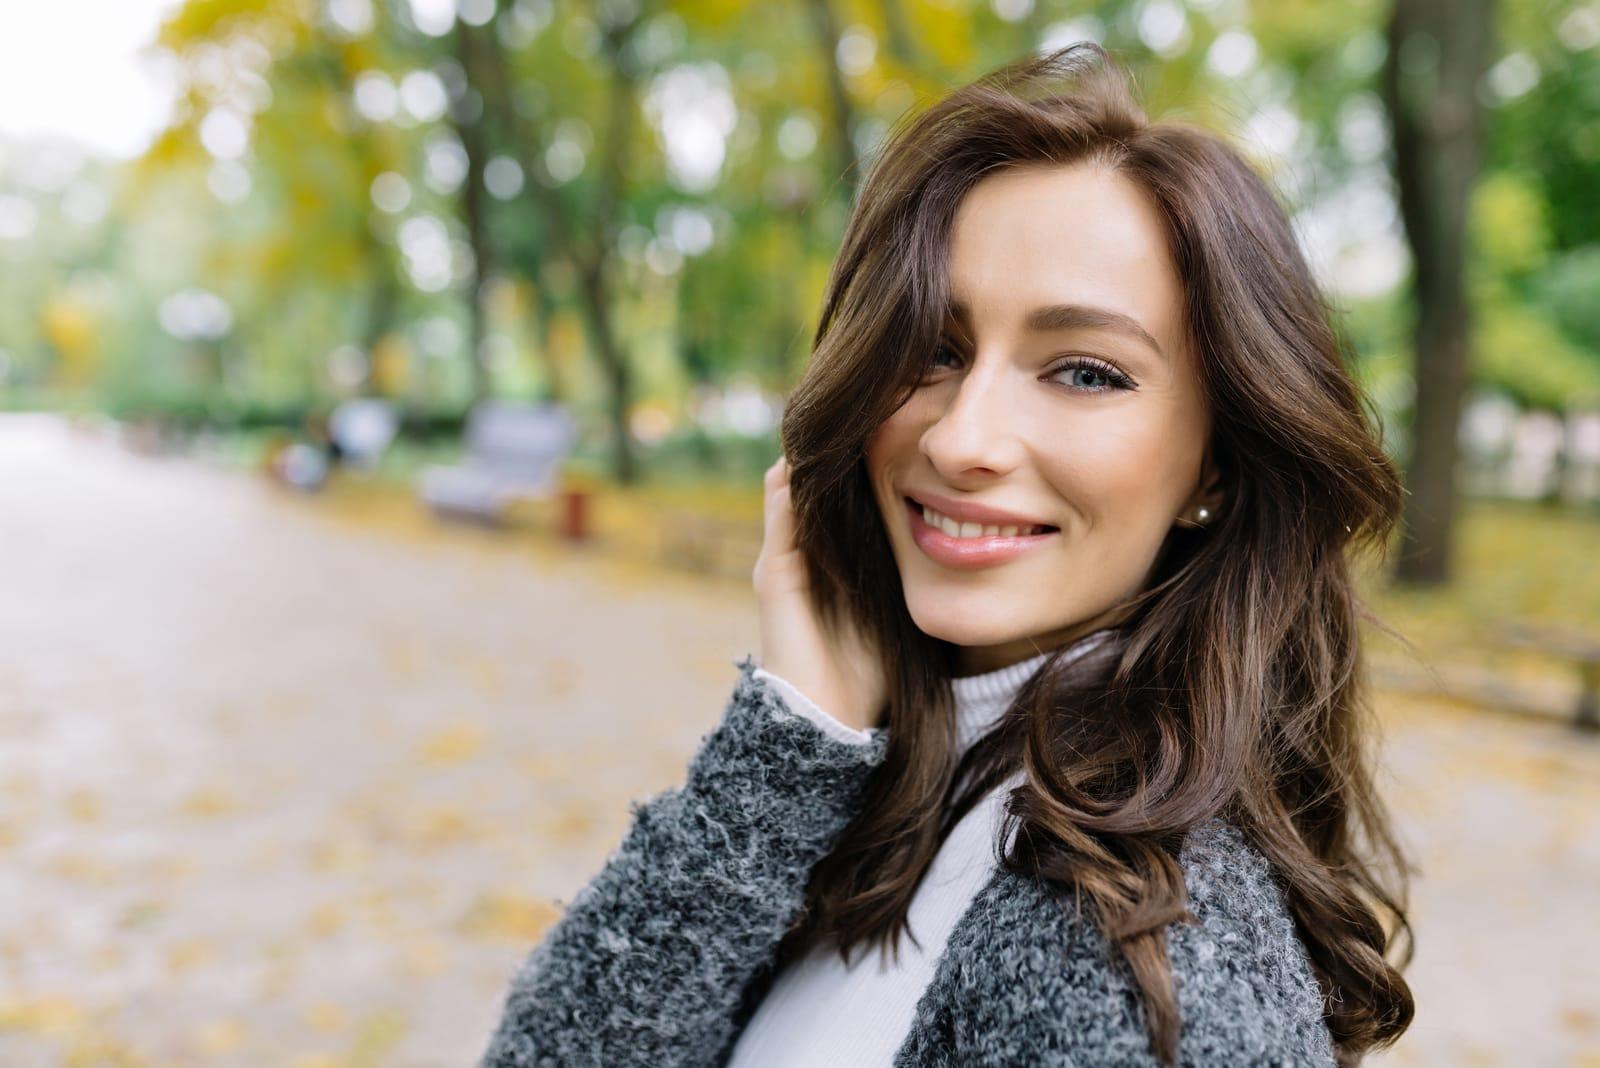 stunning woman posing